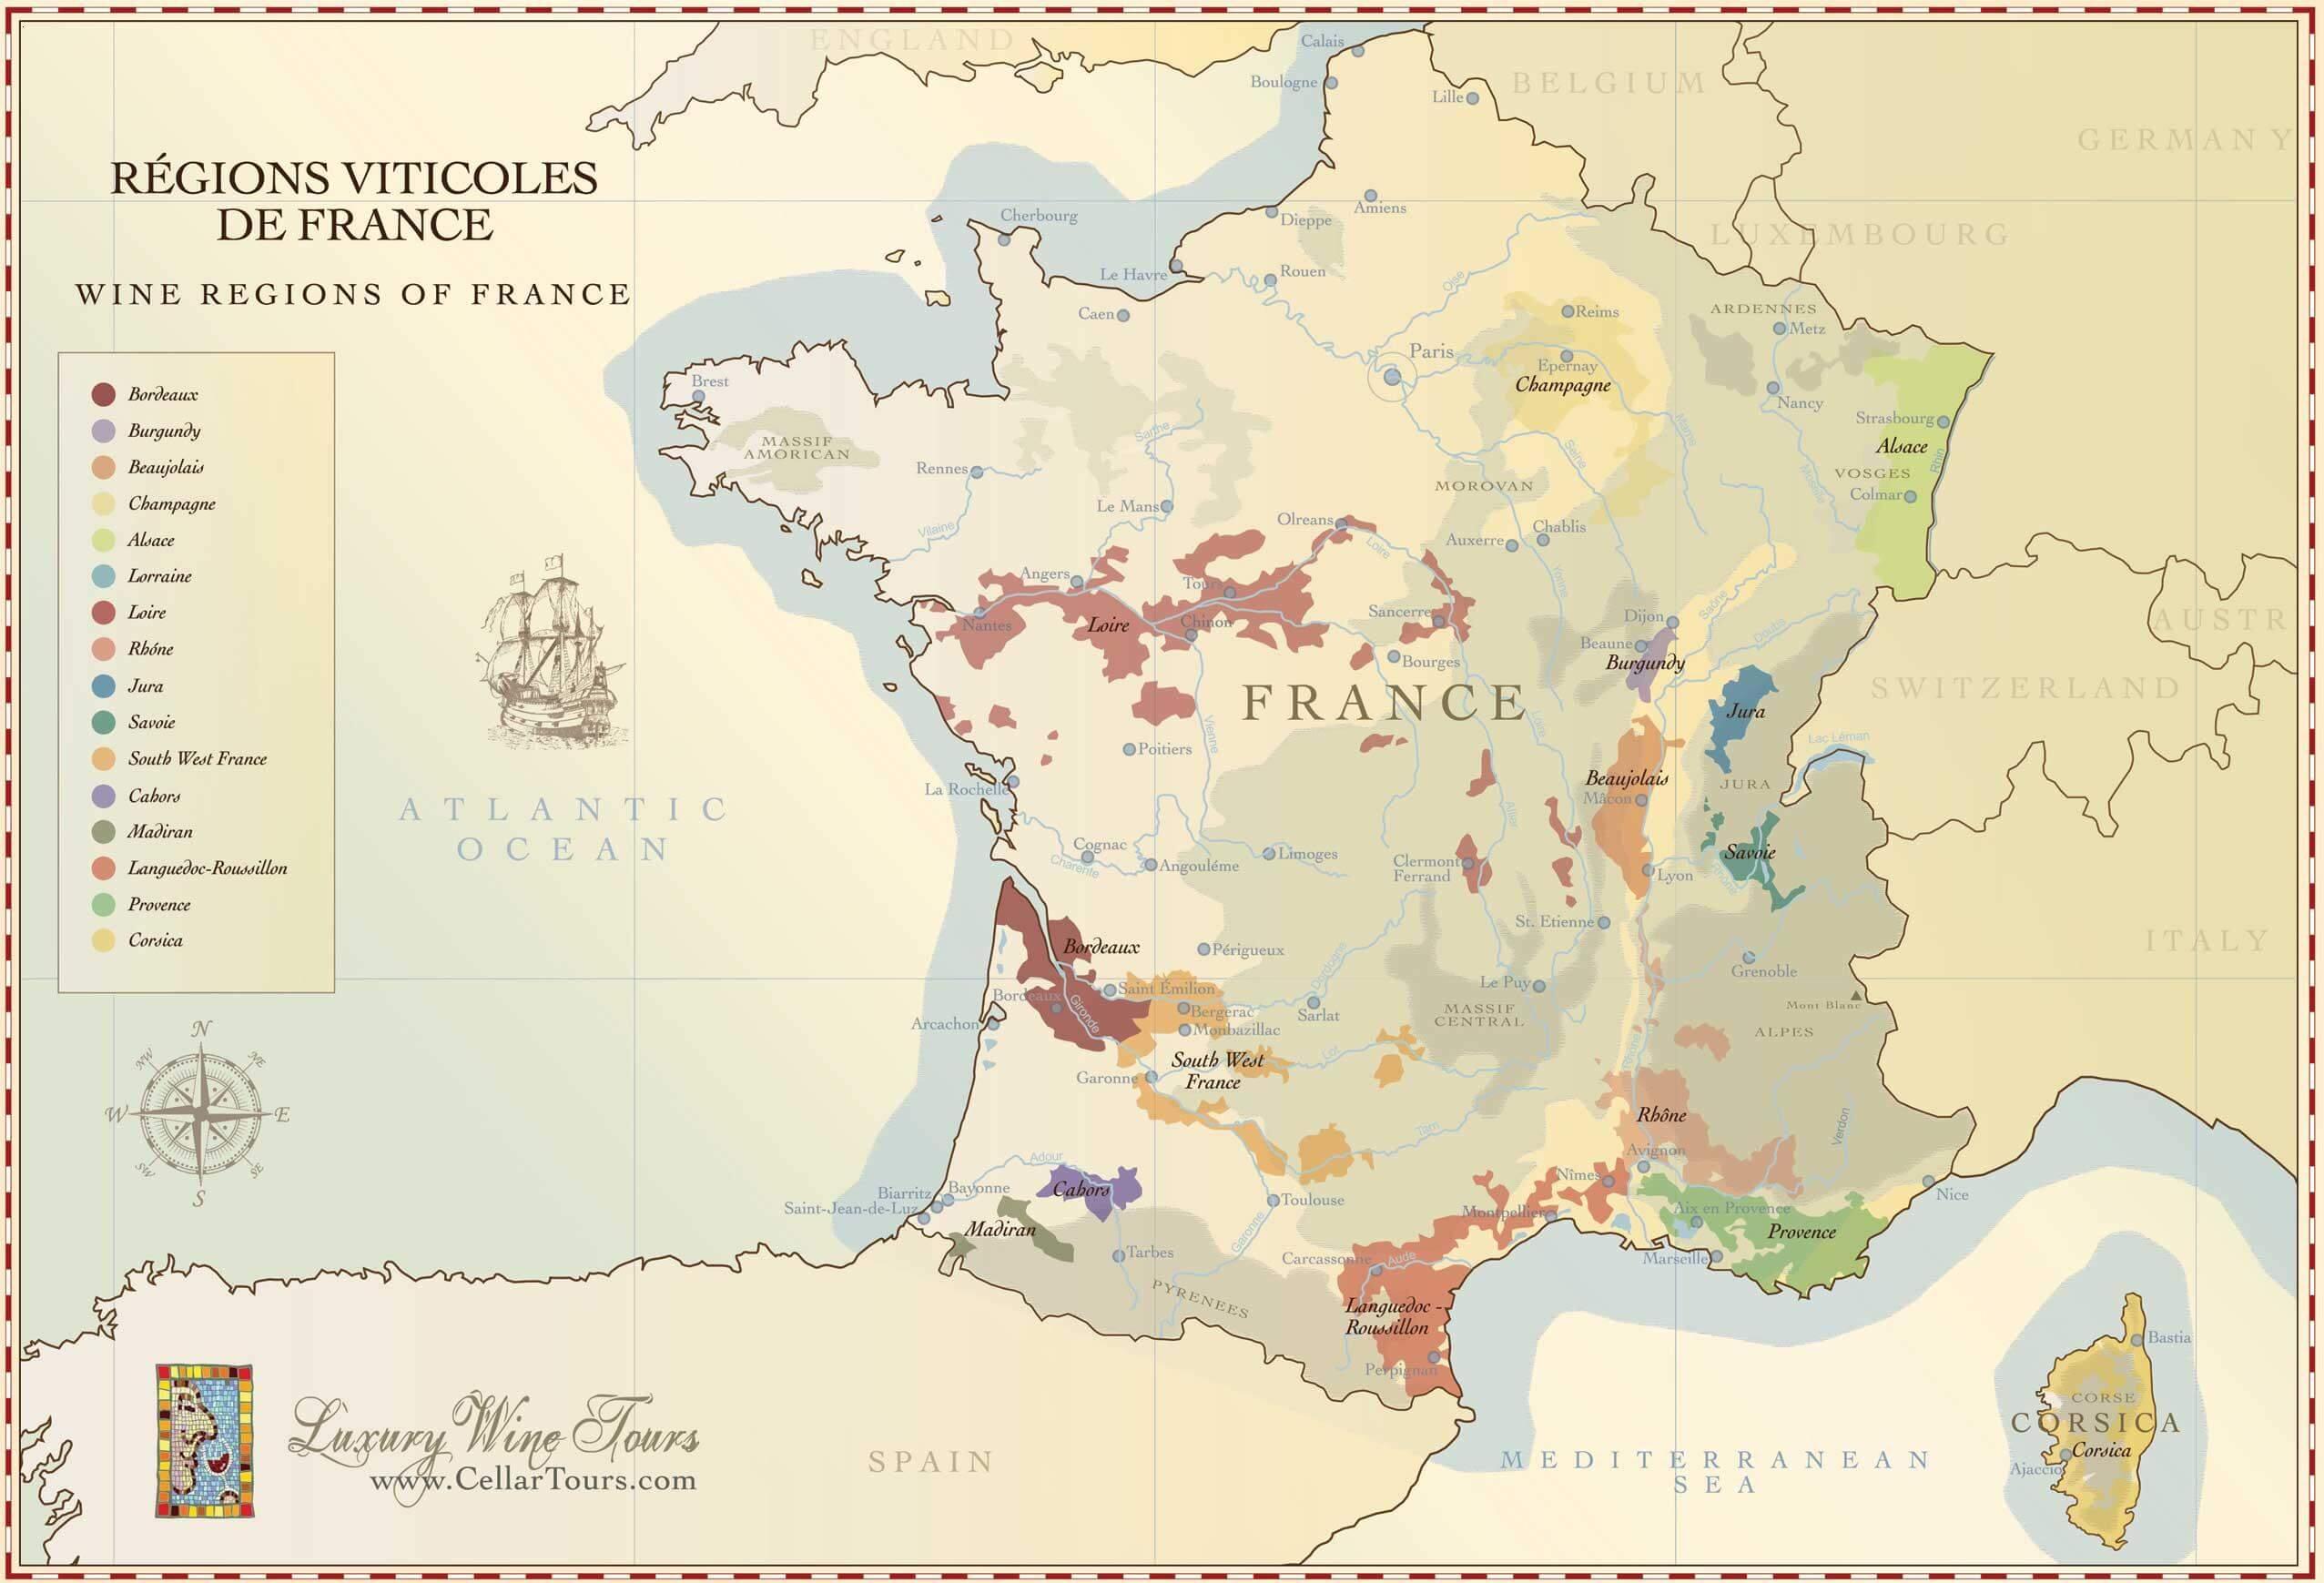 Французские вина: виды французского вина по регионам: бордо, бургундия